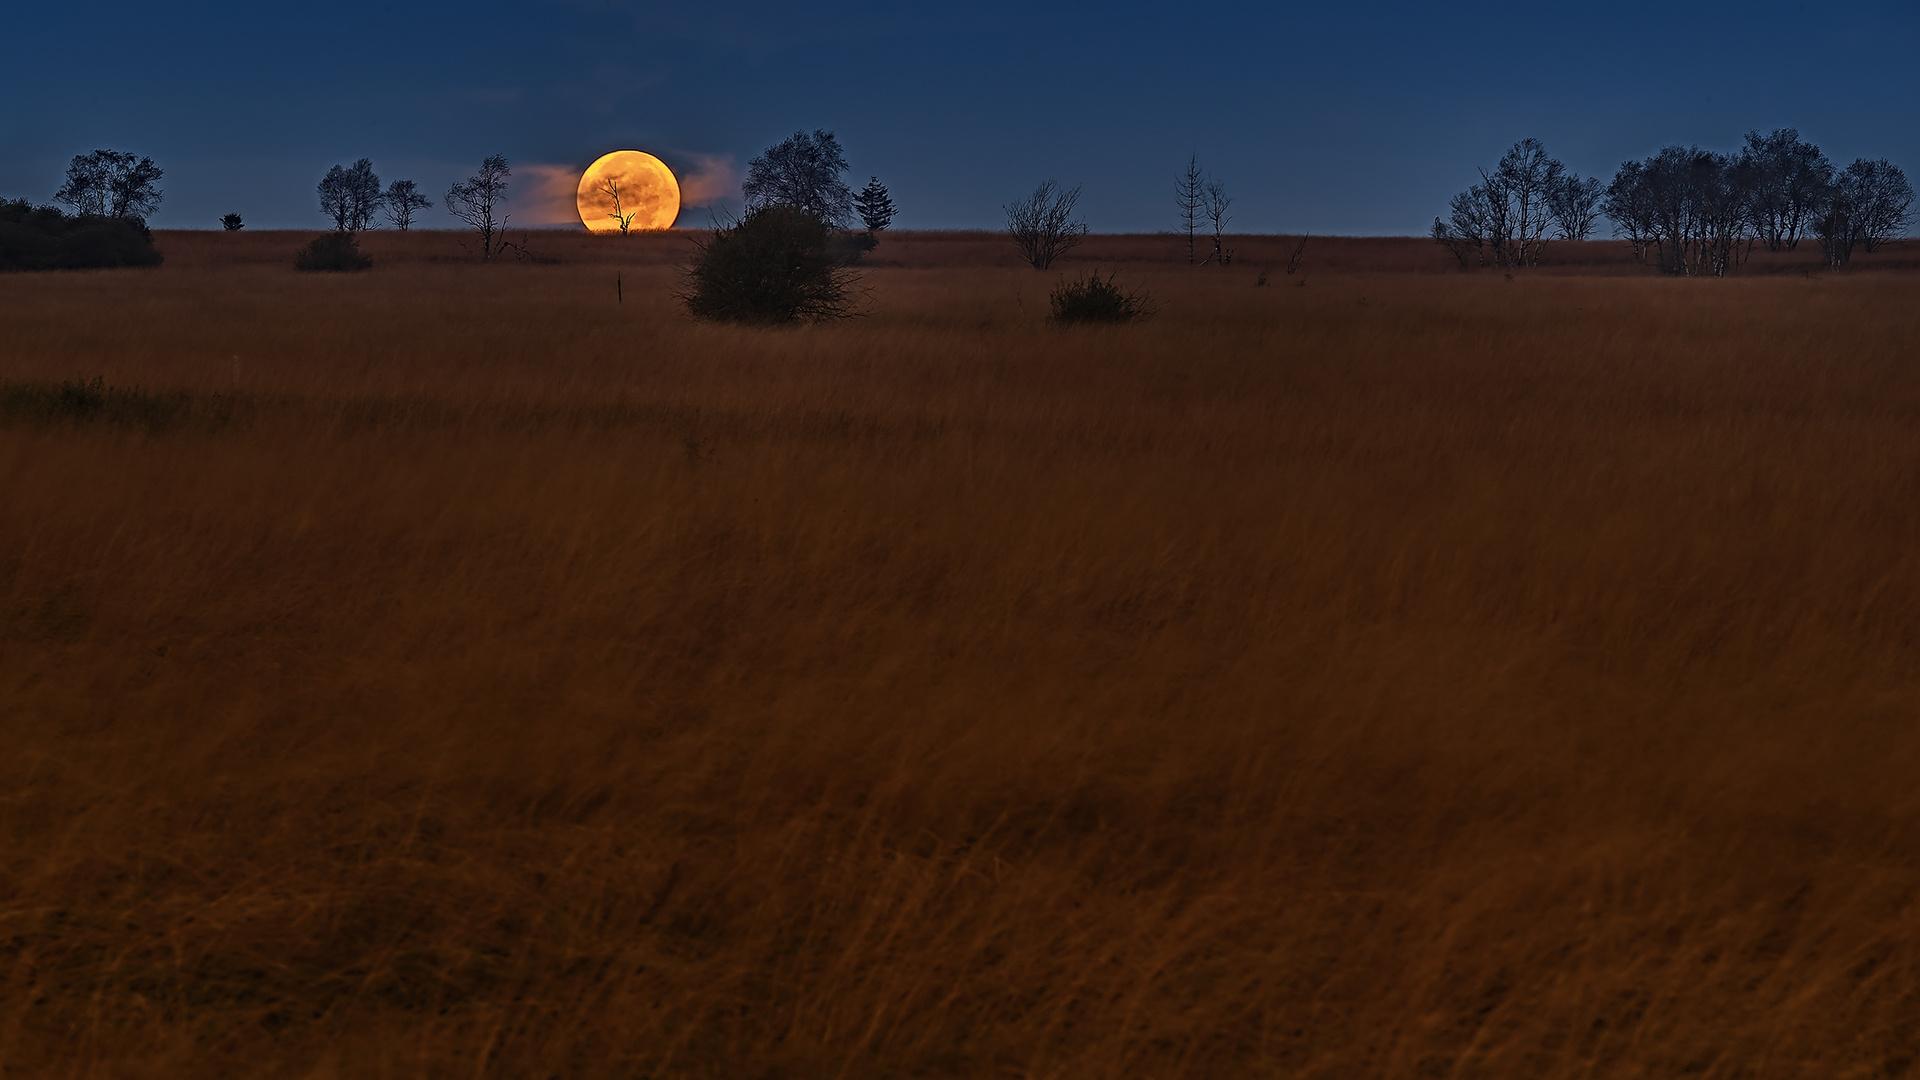 Singing in the moonlight